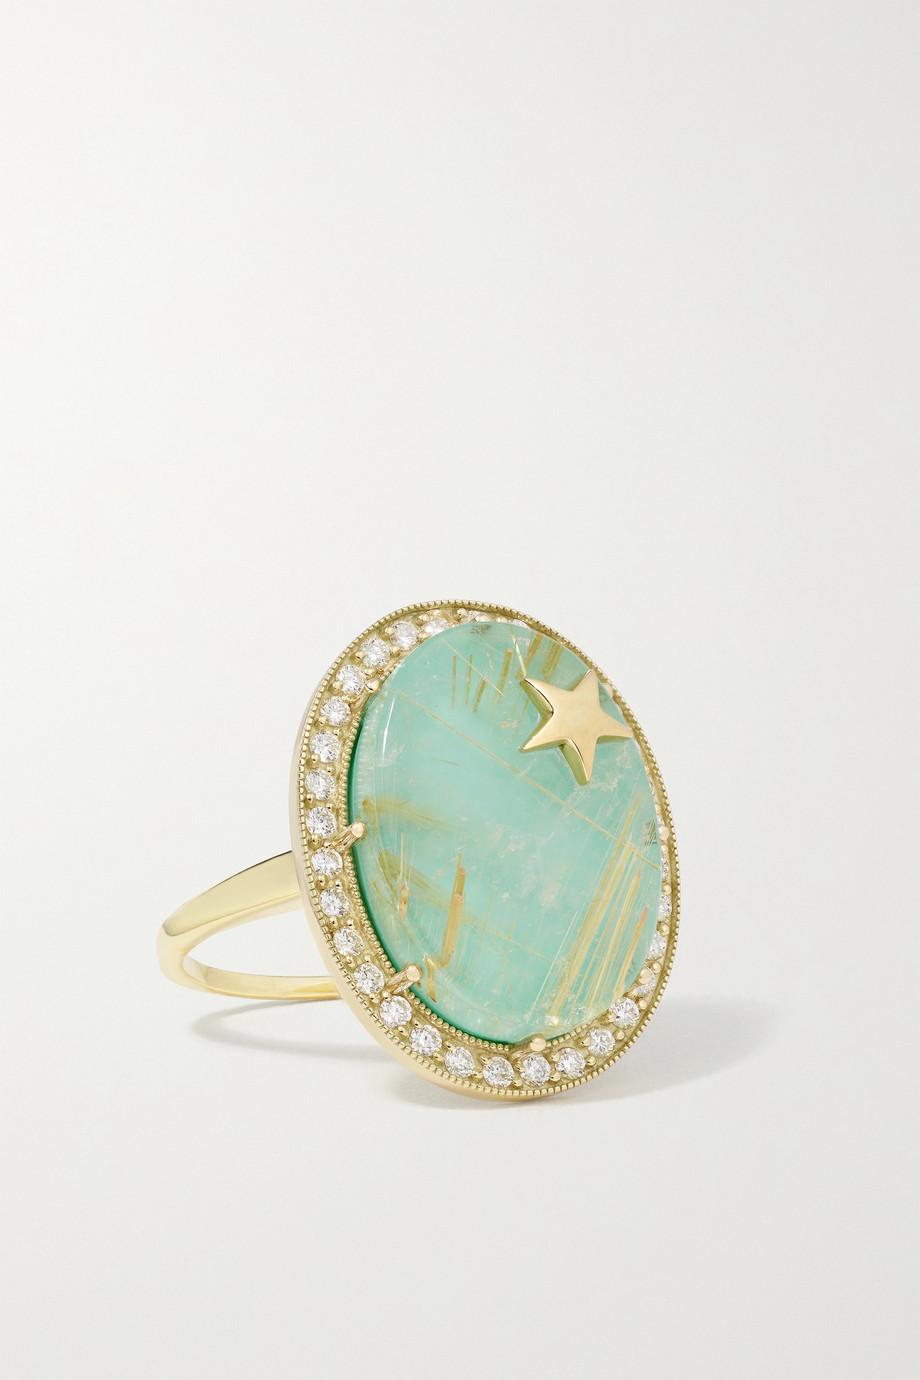 Andrea Fohrman Zenith 14-karat gold multi-stone doublet ring